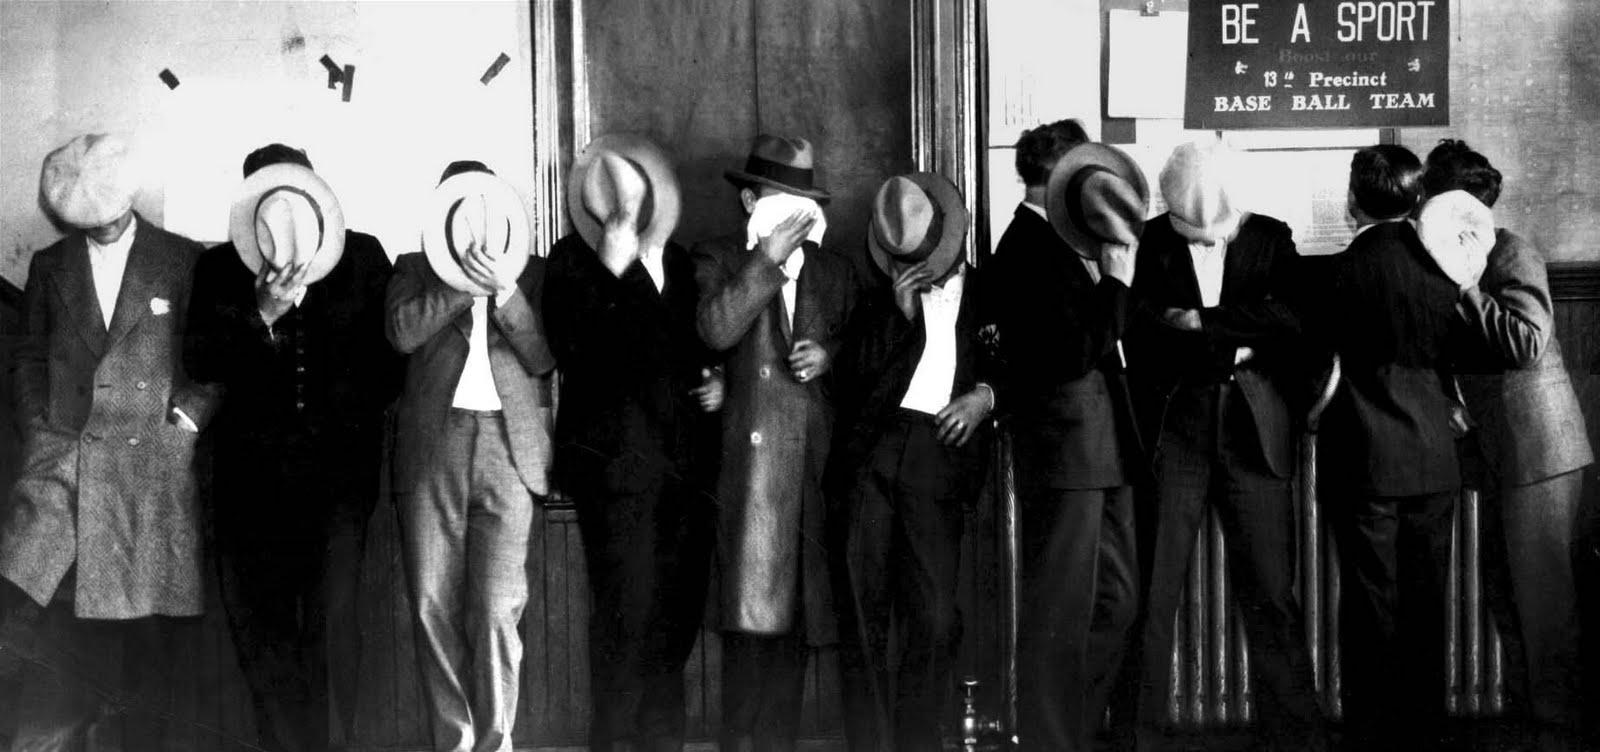 The Ralph Proctor Murder